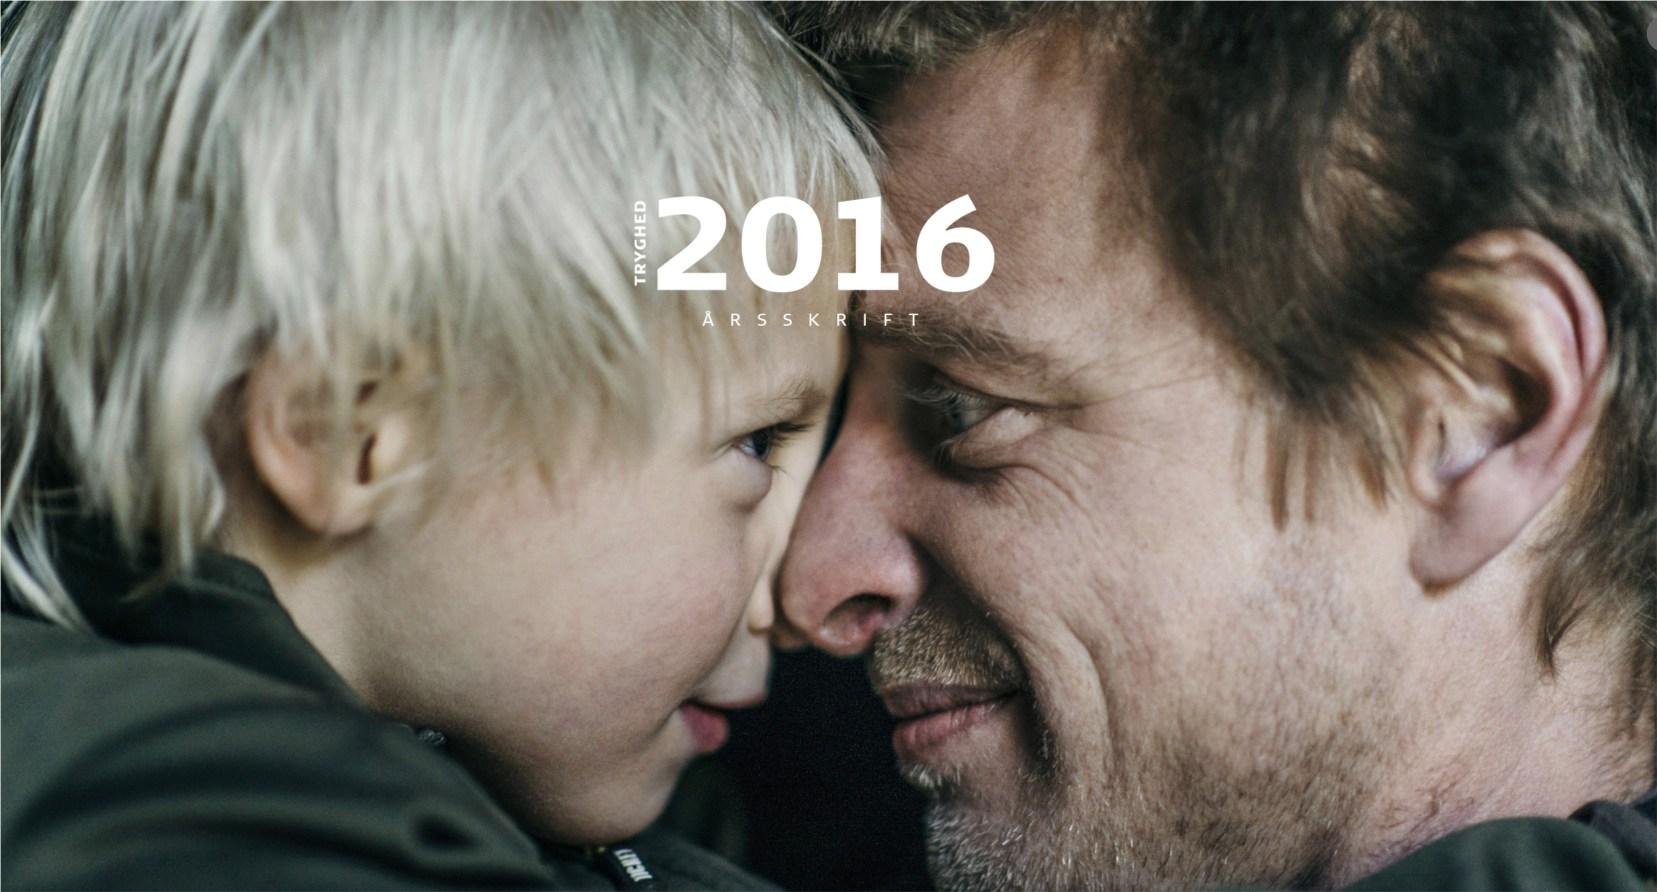 TrygFondens årsskrift 2016